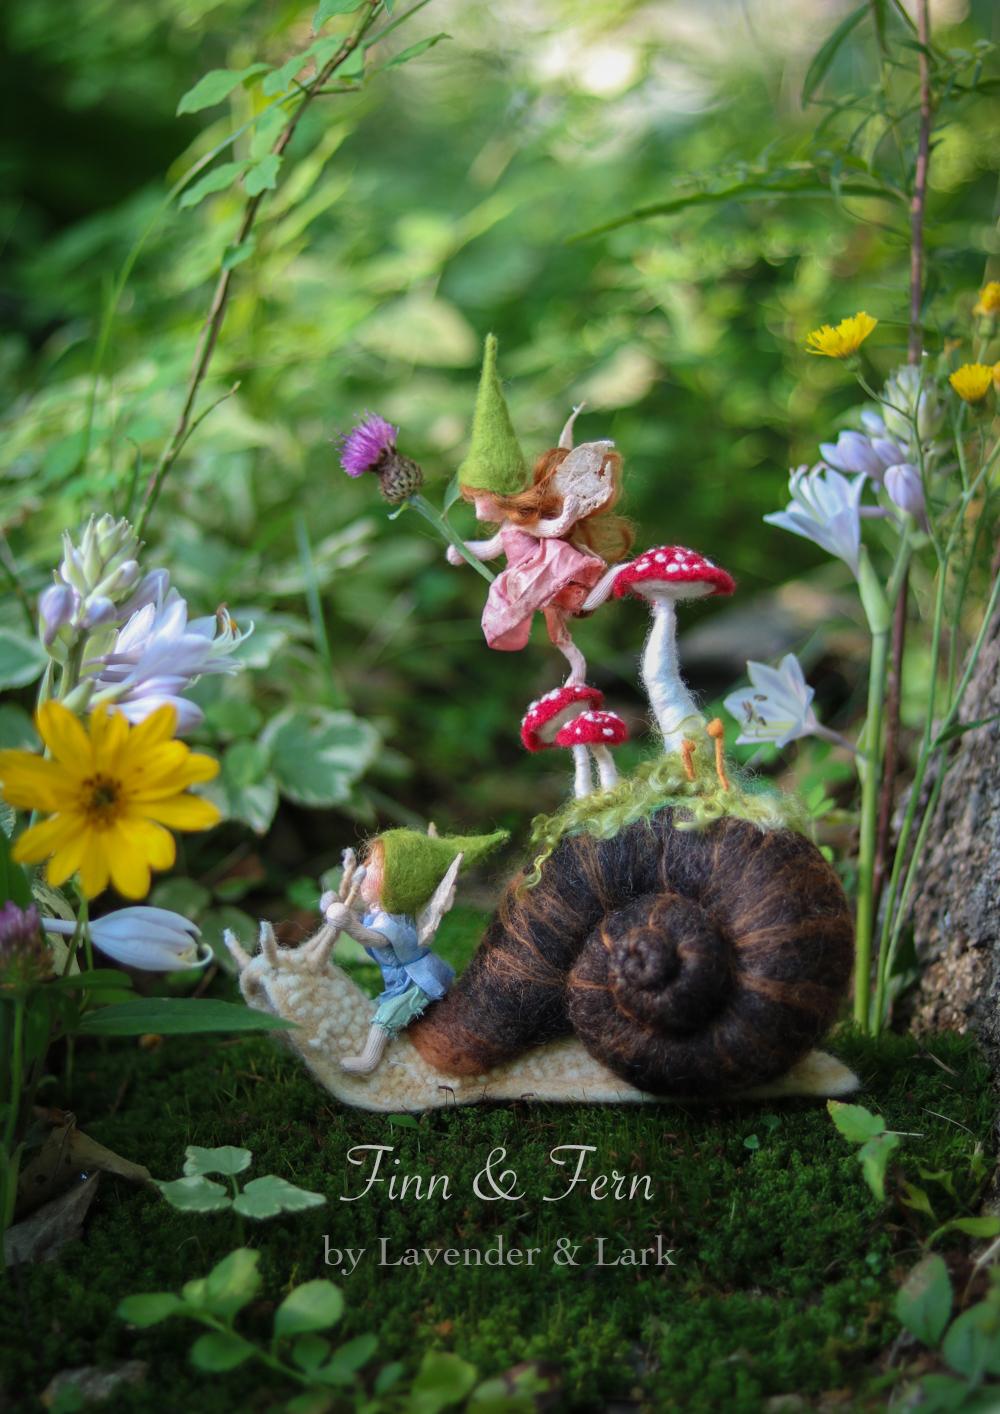 Finn & Fern by Lavender & Lark